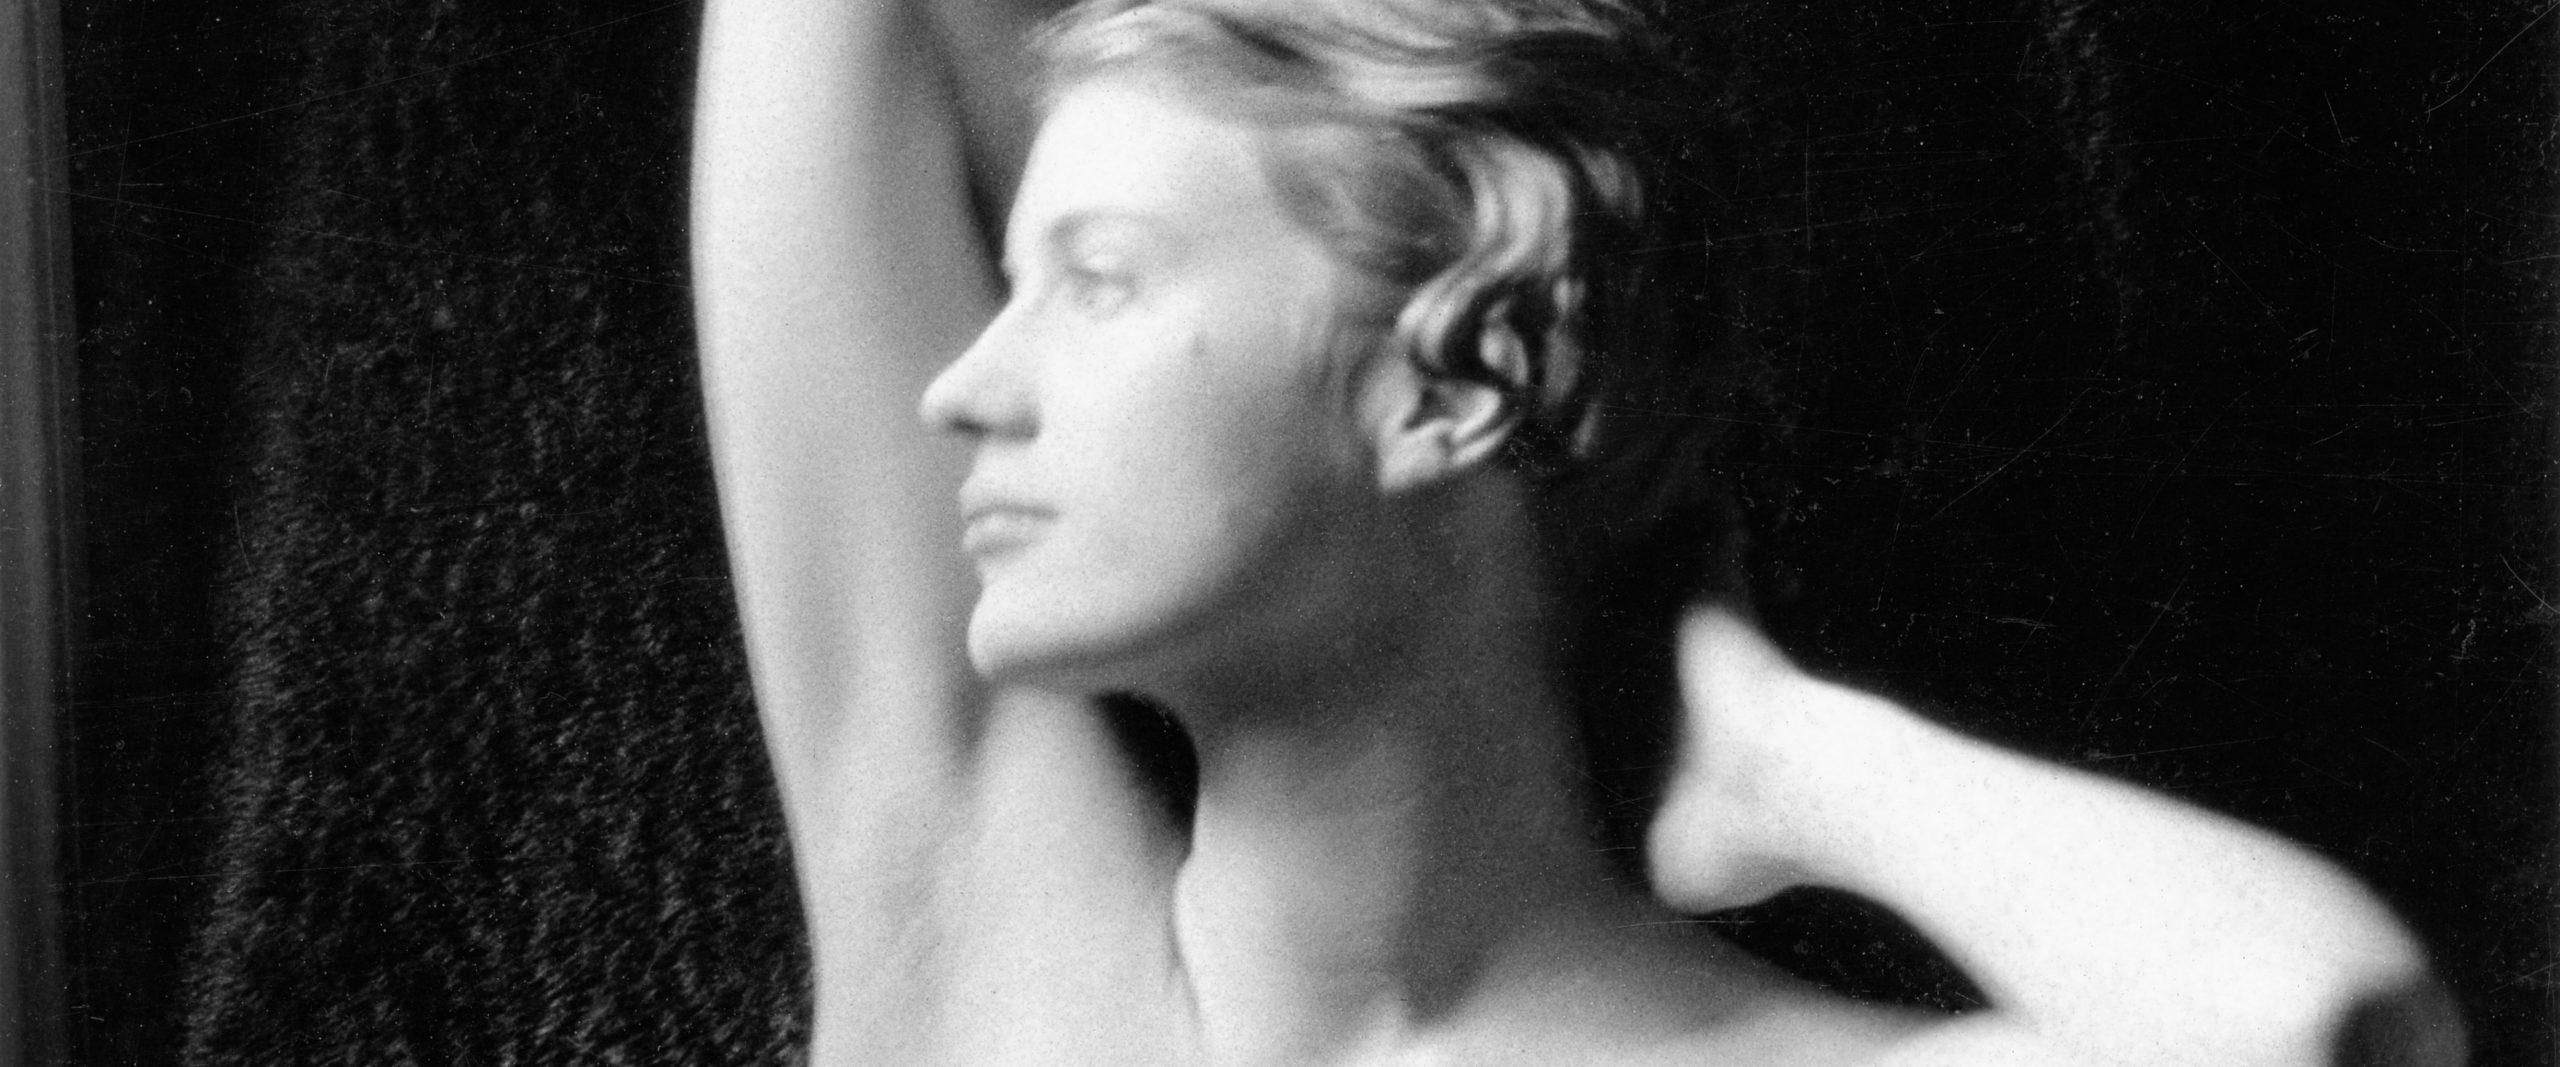 The Dali Museum, Copyright_LeeMillerArchives_Self_portrait_Paris_France_1930-scaled.jpg